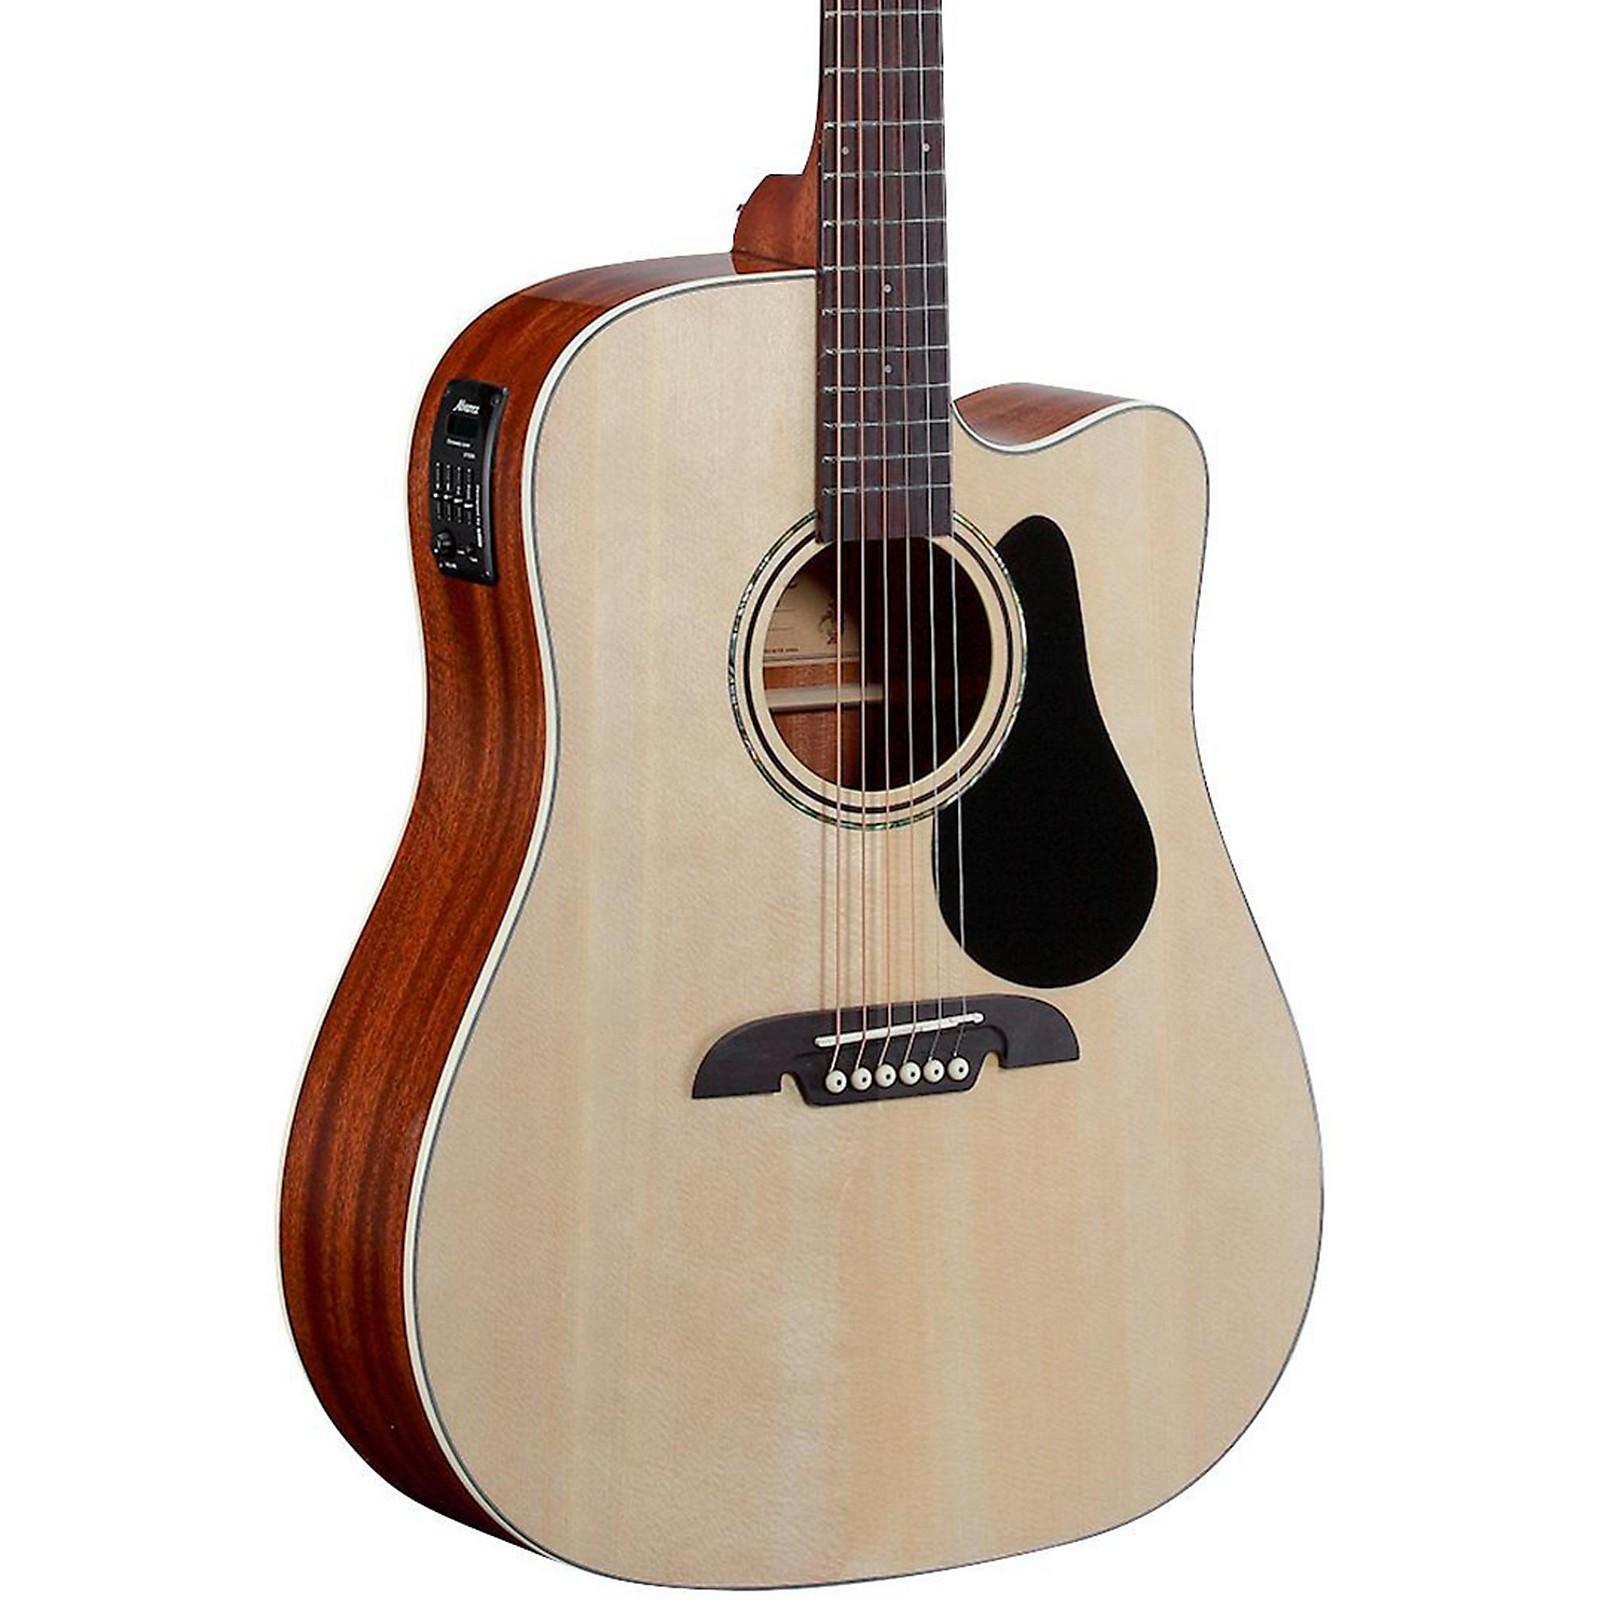 Alvarez Regent Series Dreadnought Cutaway Acoustic-Electric Guitar